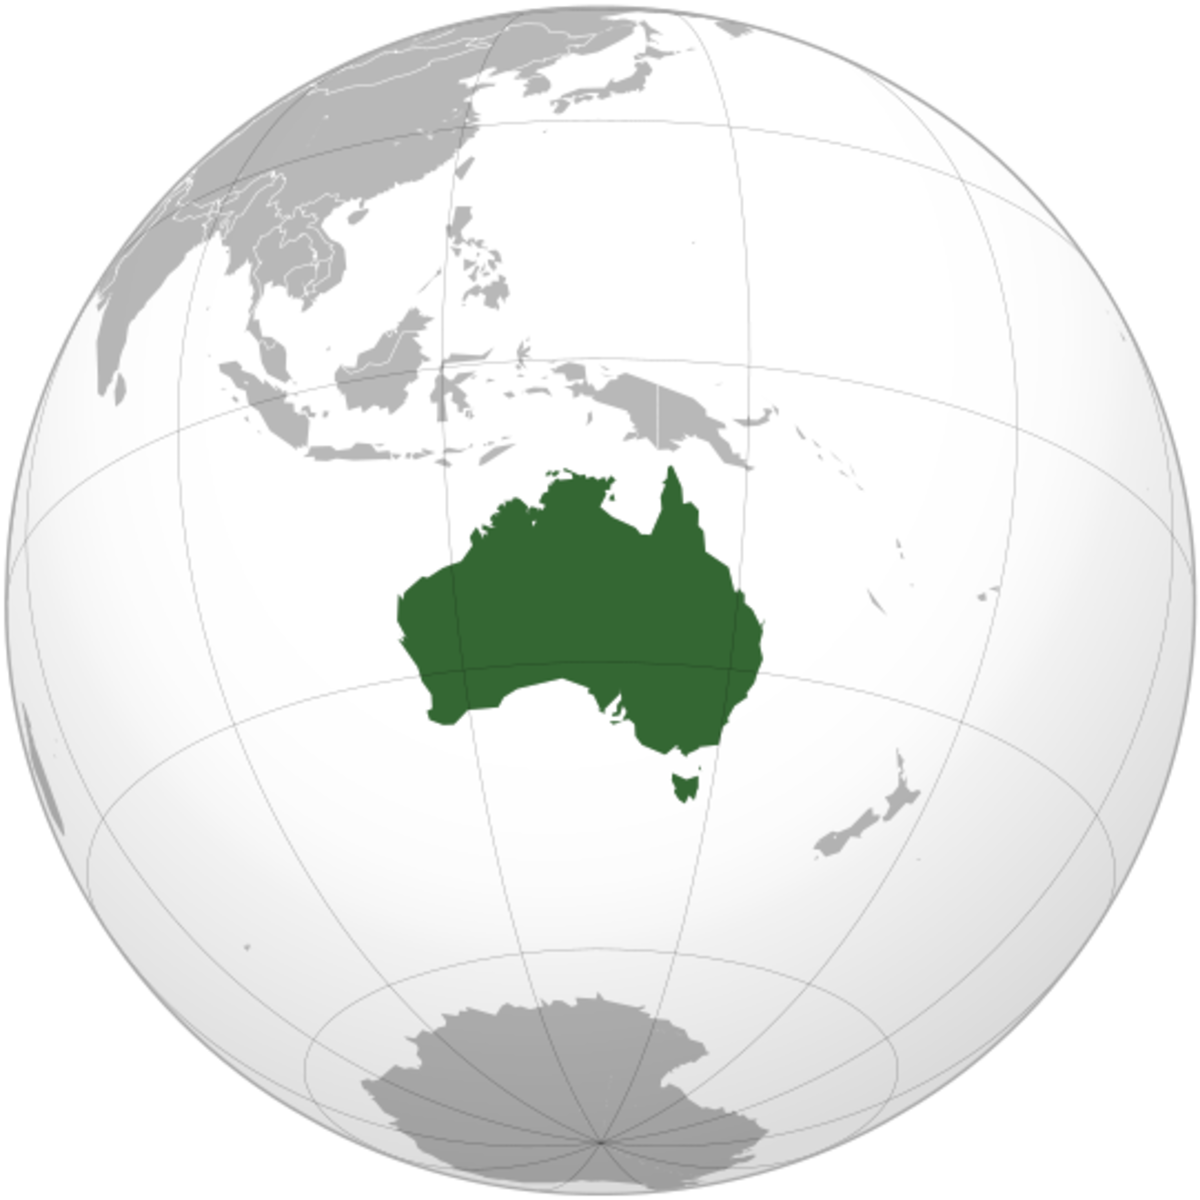 Map showing Australia's location